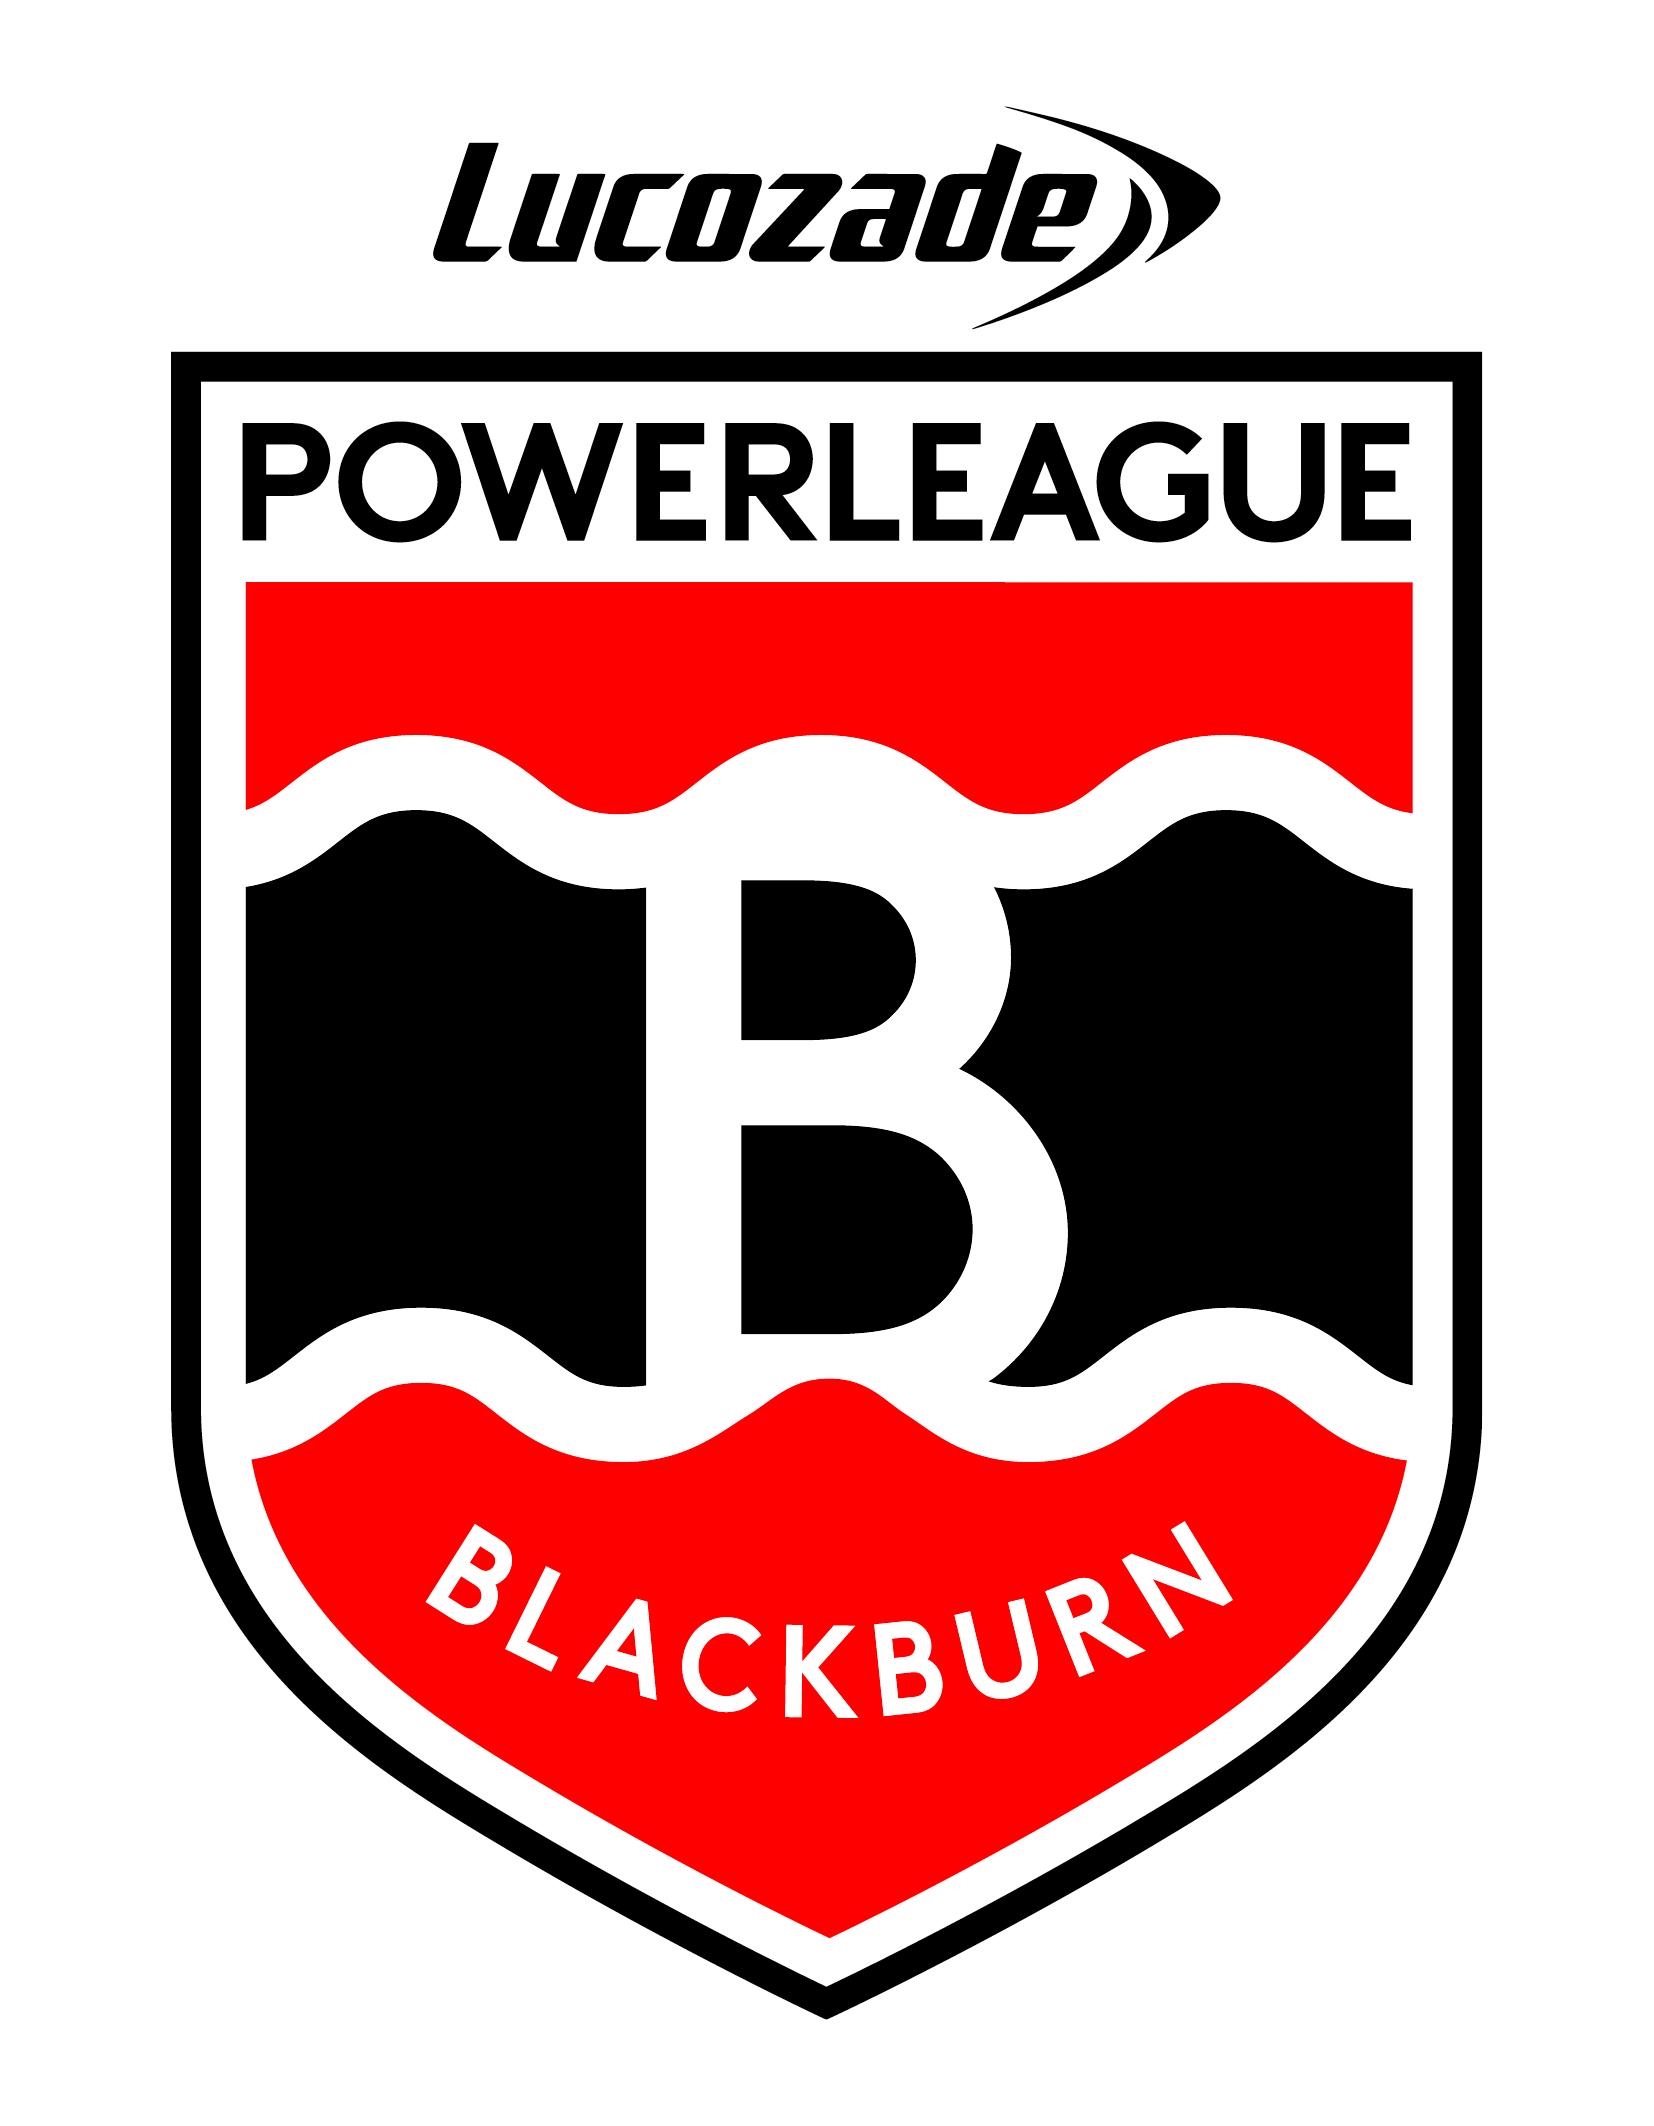 Powerleague Blackburn Crest